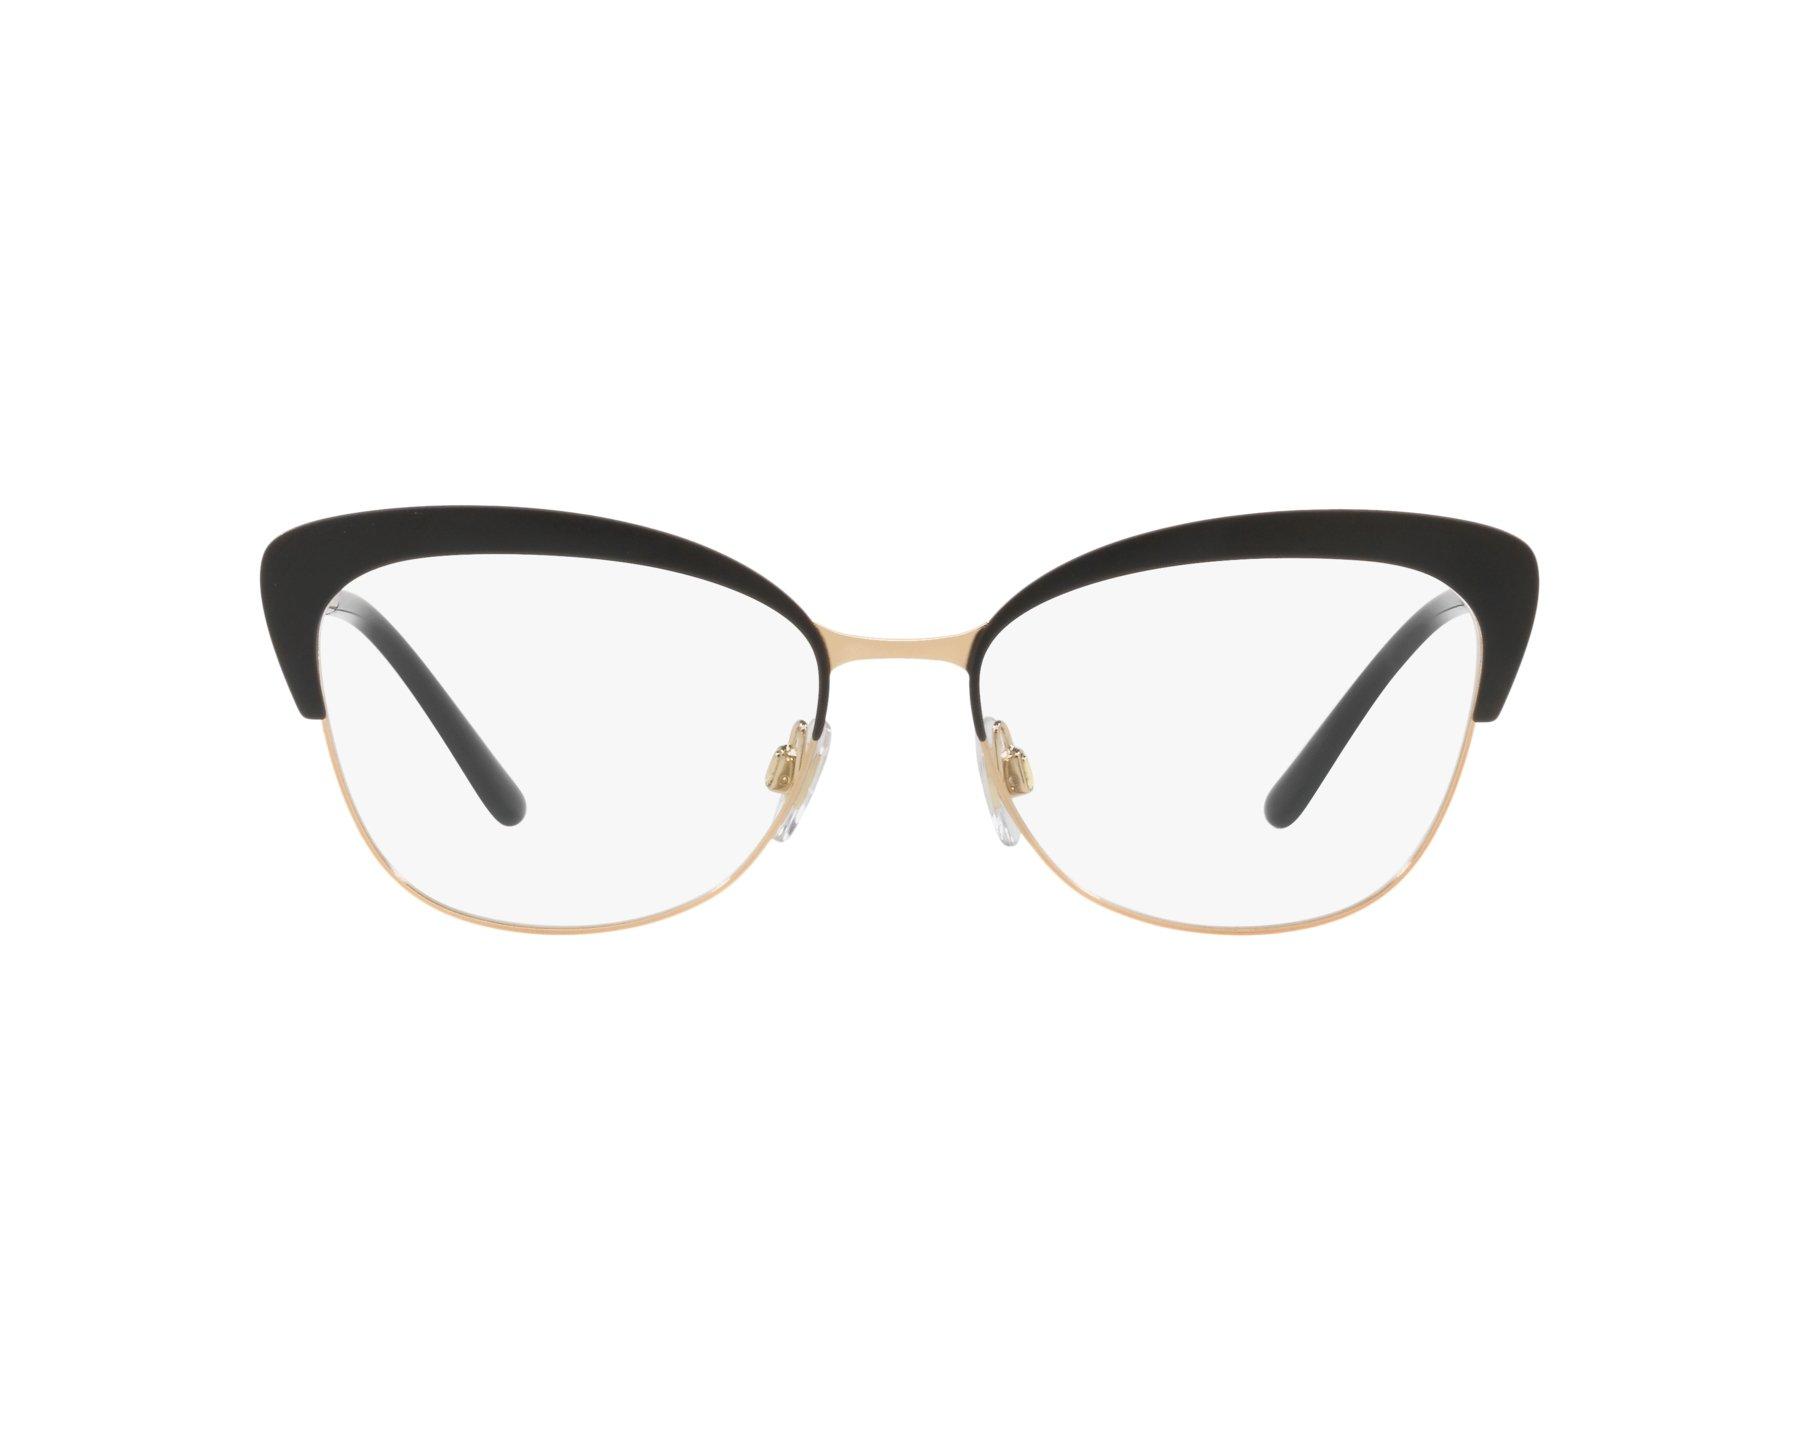 Dolce & Gabbana Eyeglasses Black DG-1298 01 - Visionet US